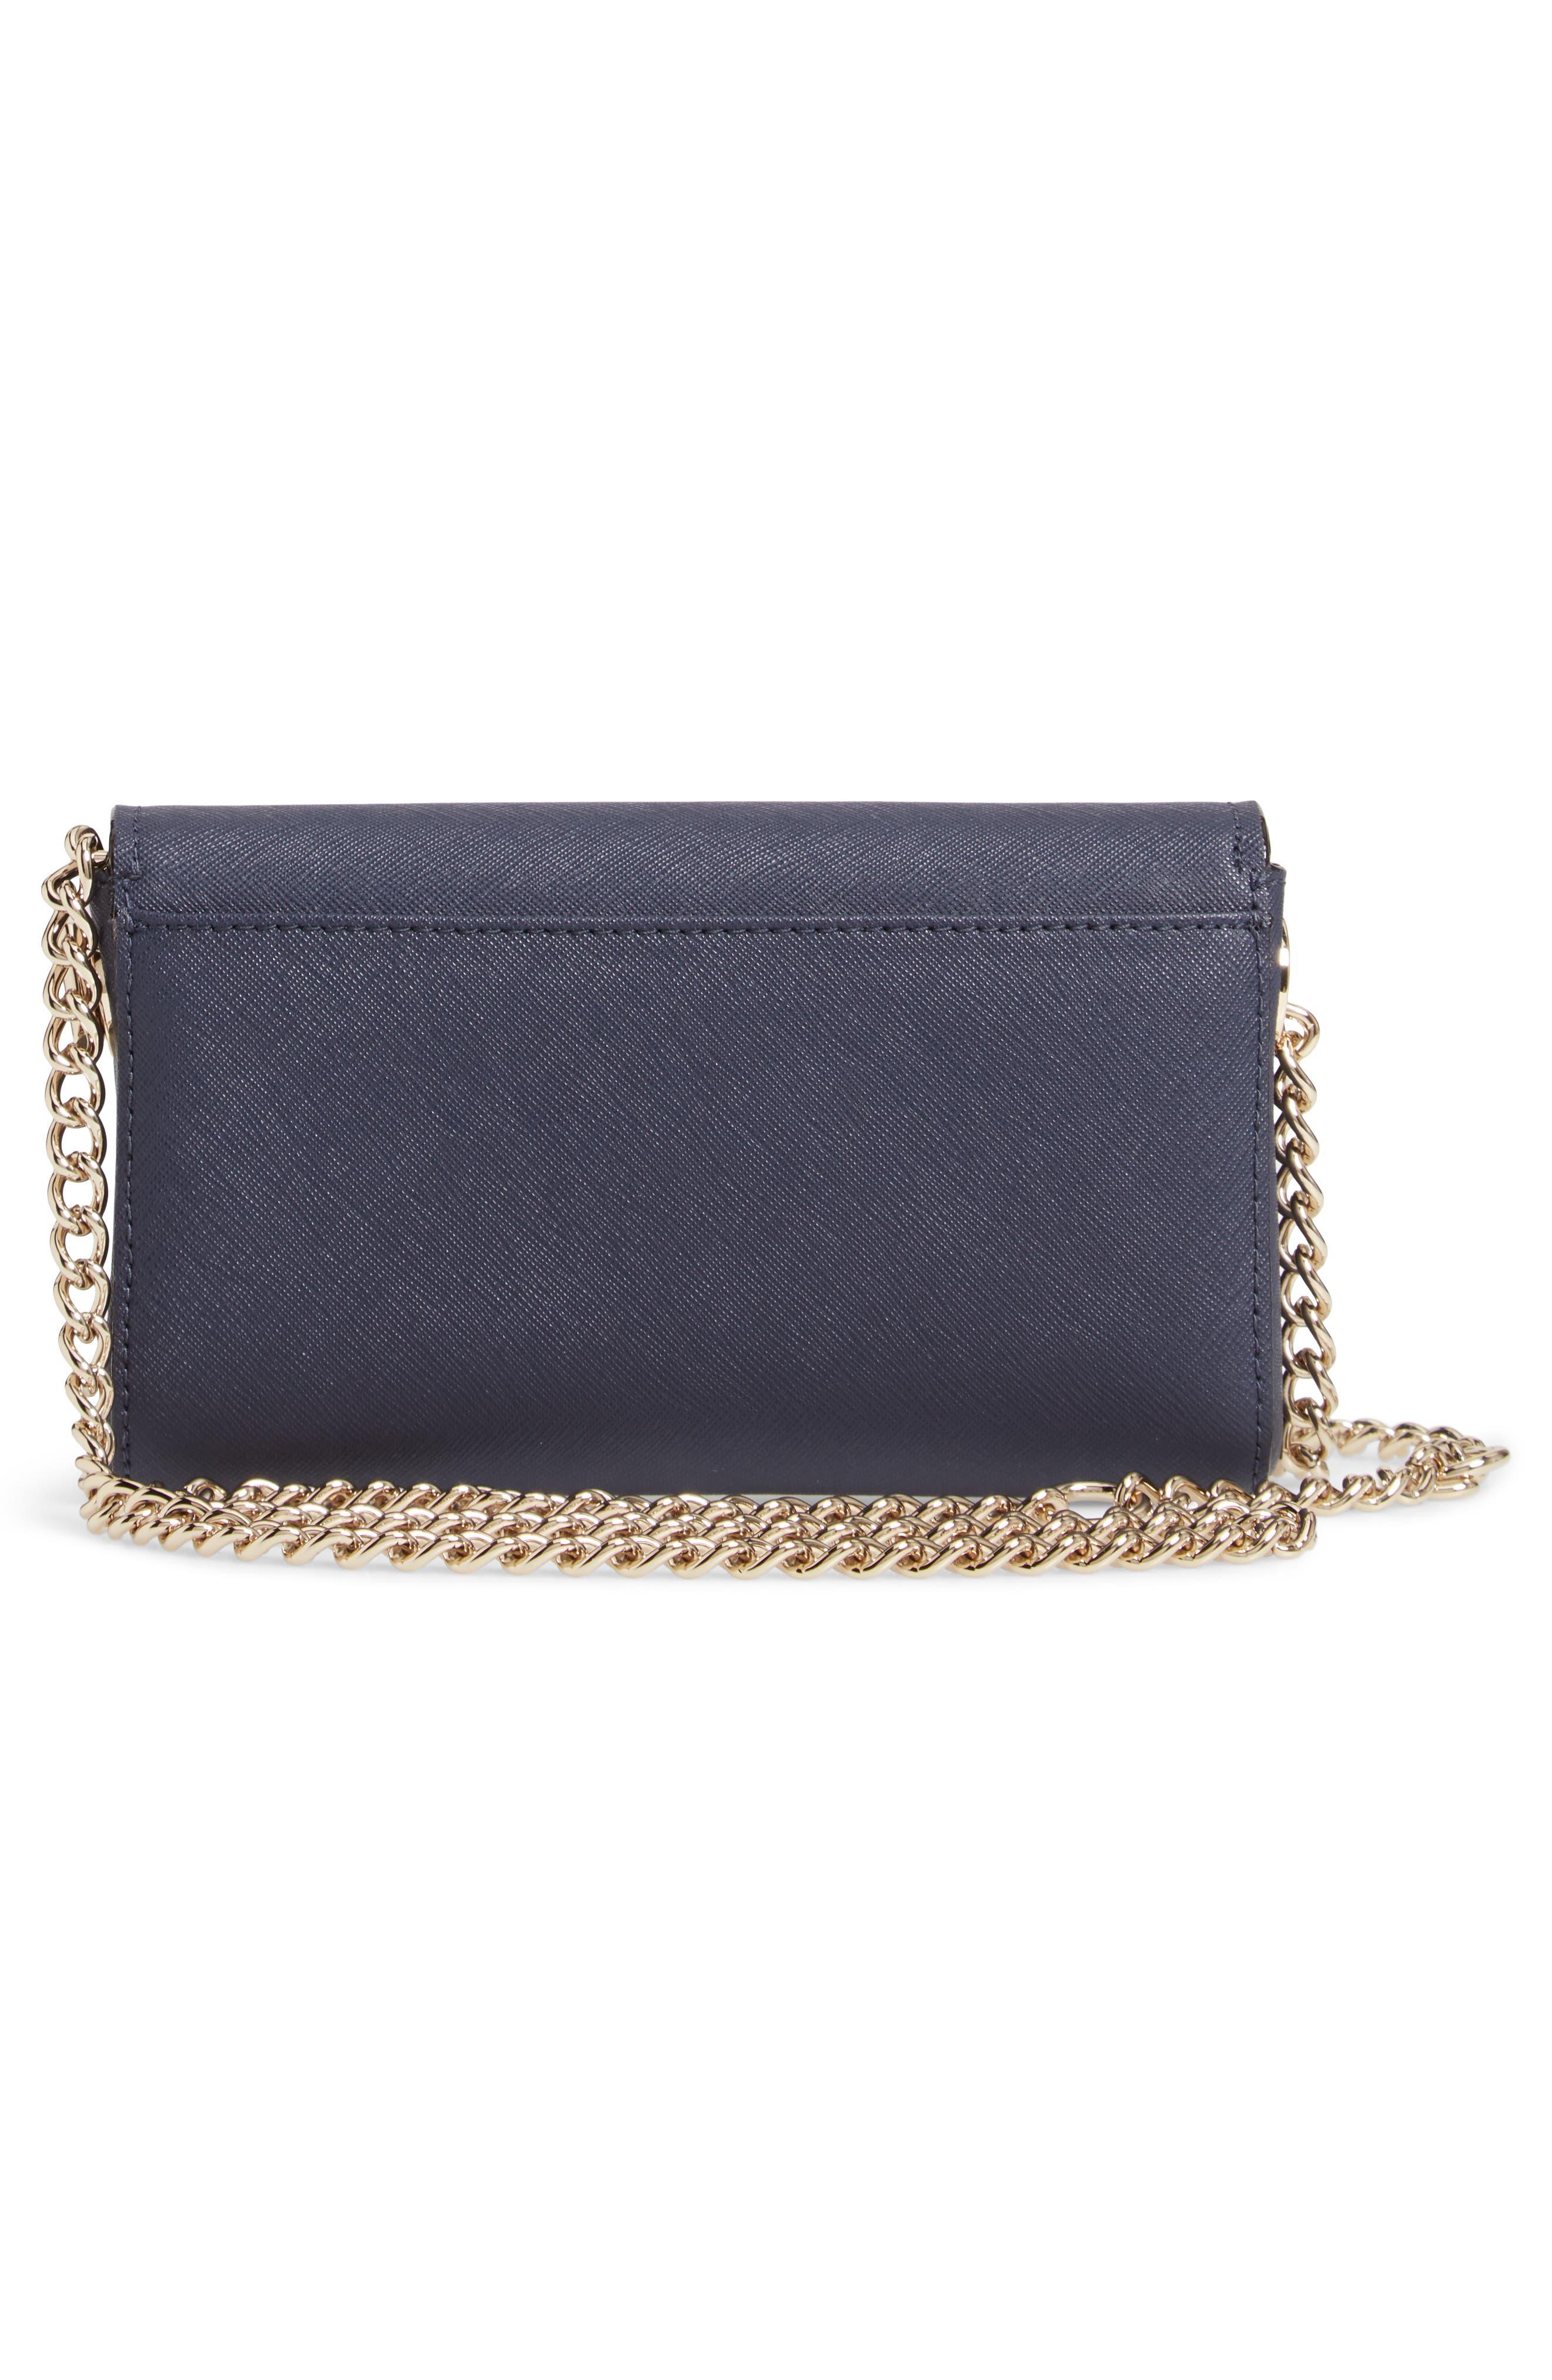 cameron street - delilah belt bag,                             Alternate thumbnail 3, color,                             BLAZER BLUE